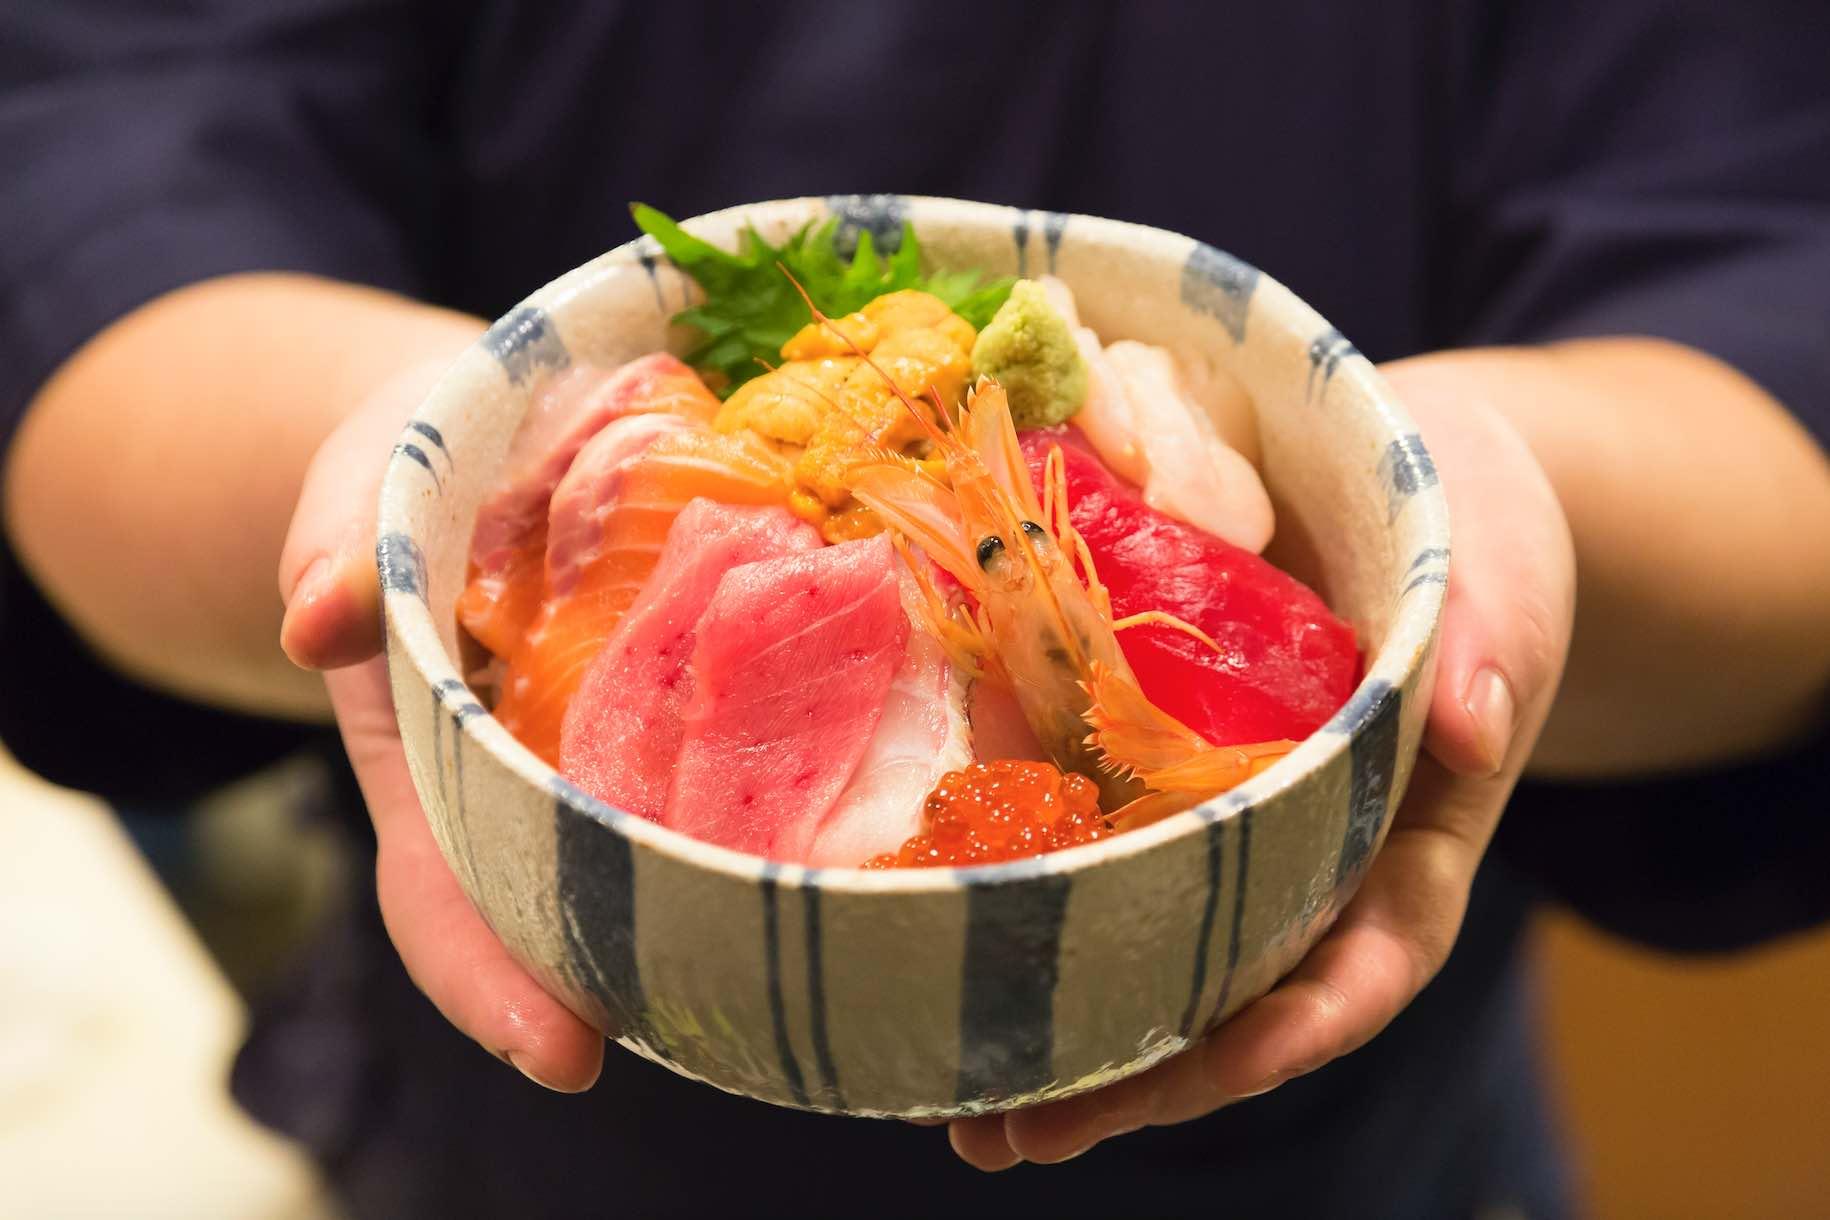 Tempura Tsukiji Tenka Sushi Bowl Japan Food Town Singapore - AspirantSG